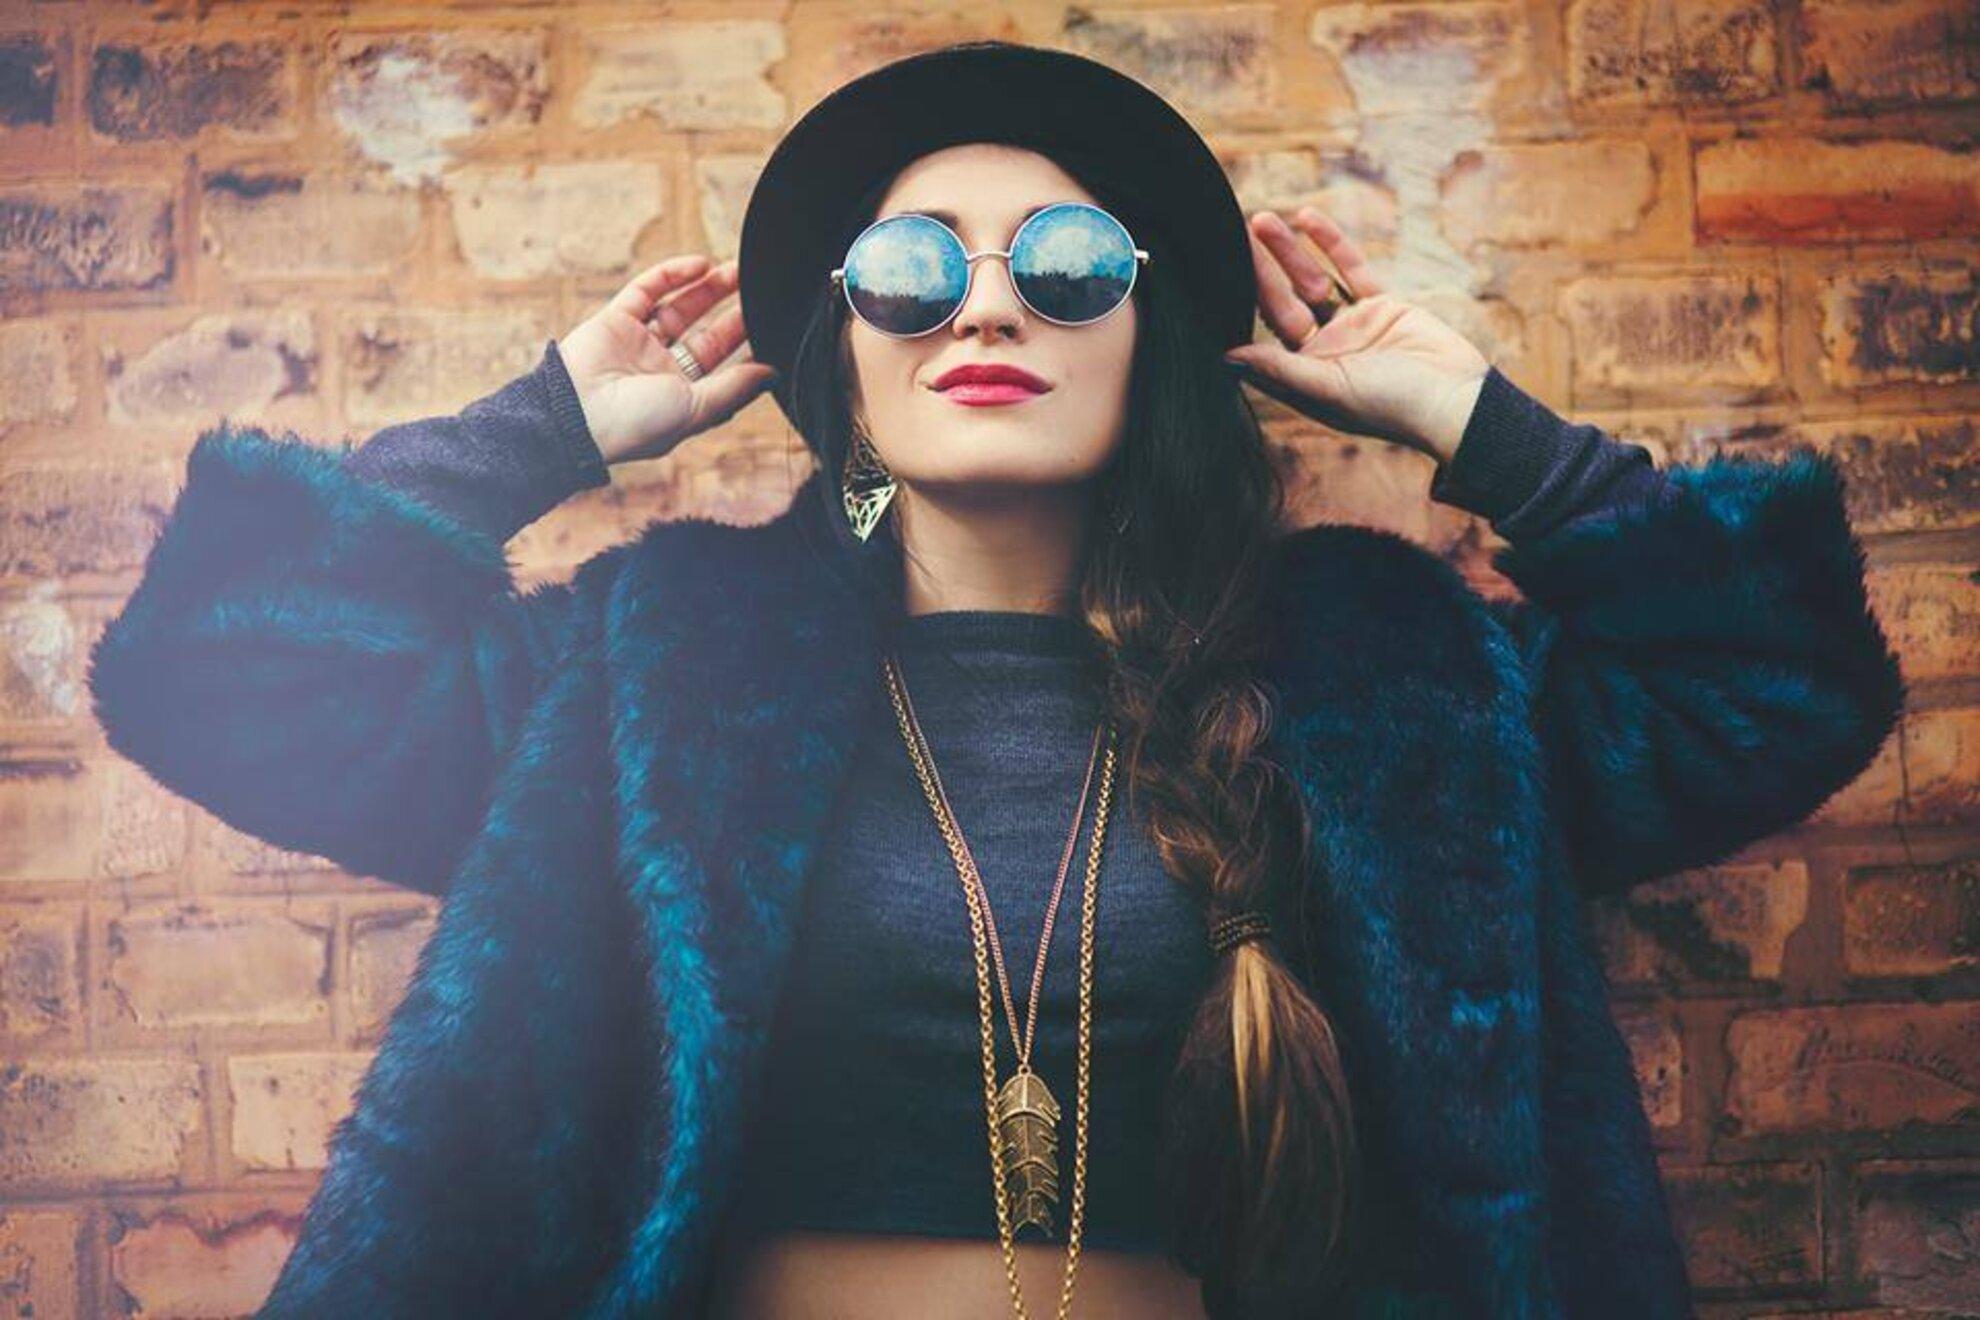 új stílusok előnézete legjobb árak The future looks bright for Budapest-based diva Antonia Vai